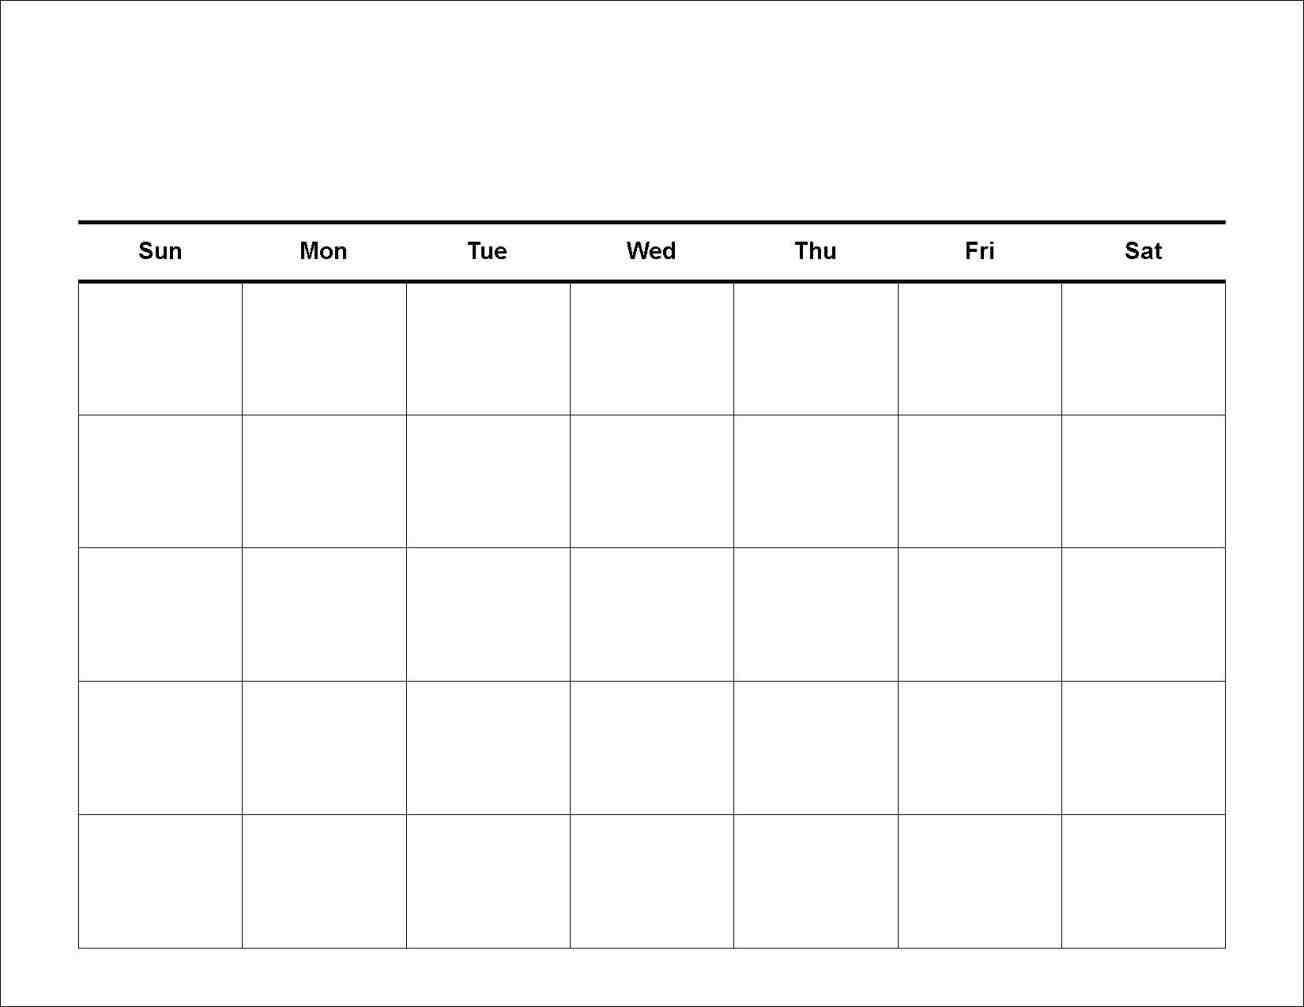 Free 7 Day Blank Calendar | Igotlockedout within Blank 7 Day Calendar To Print